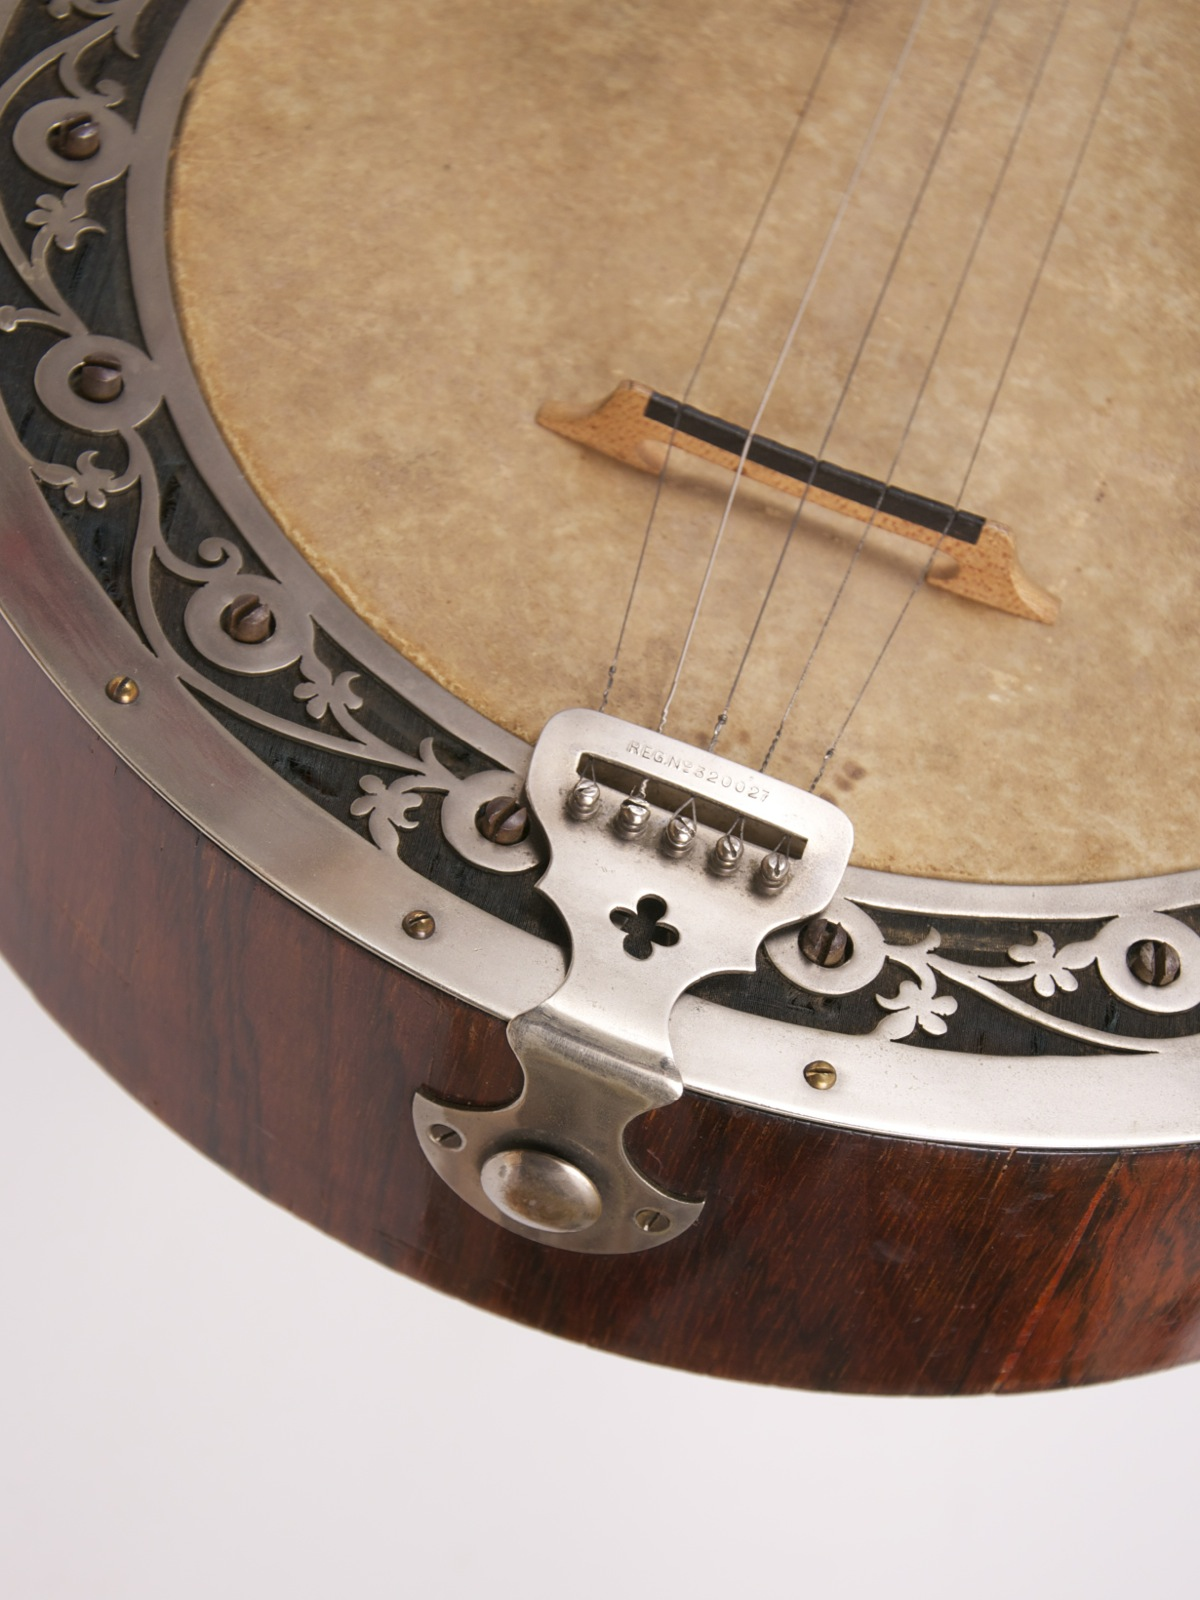 1872-banjo-A.-Wilmshurst-15